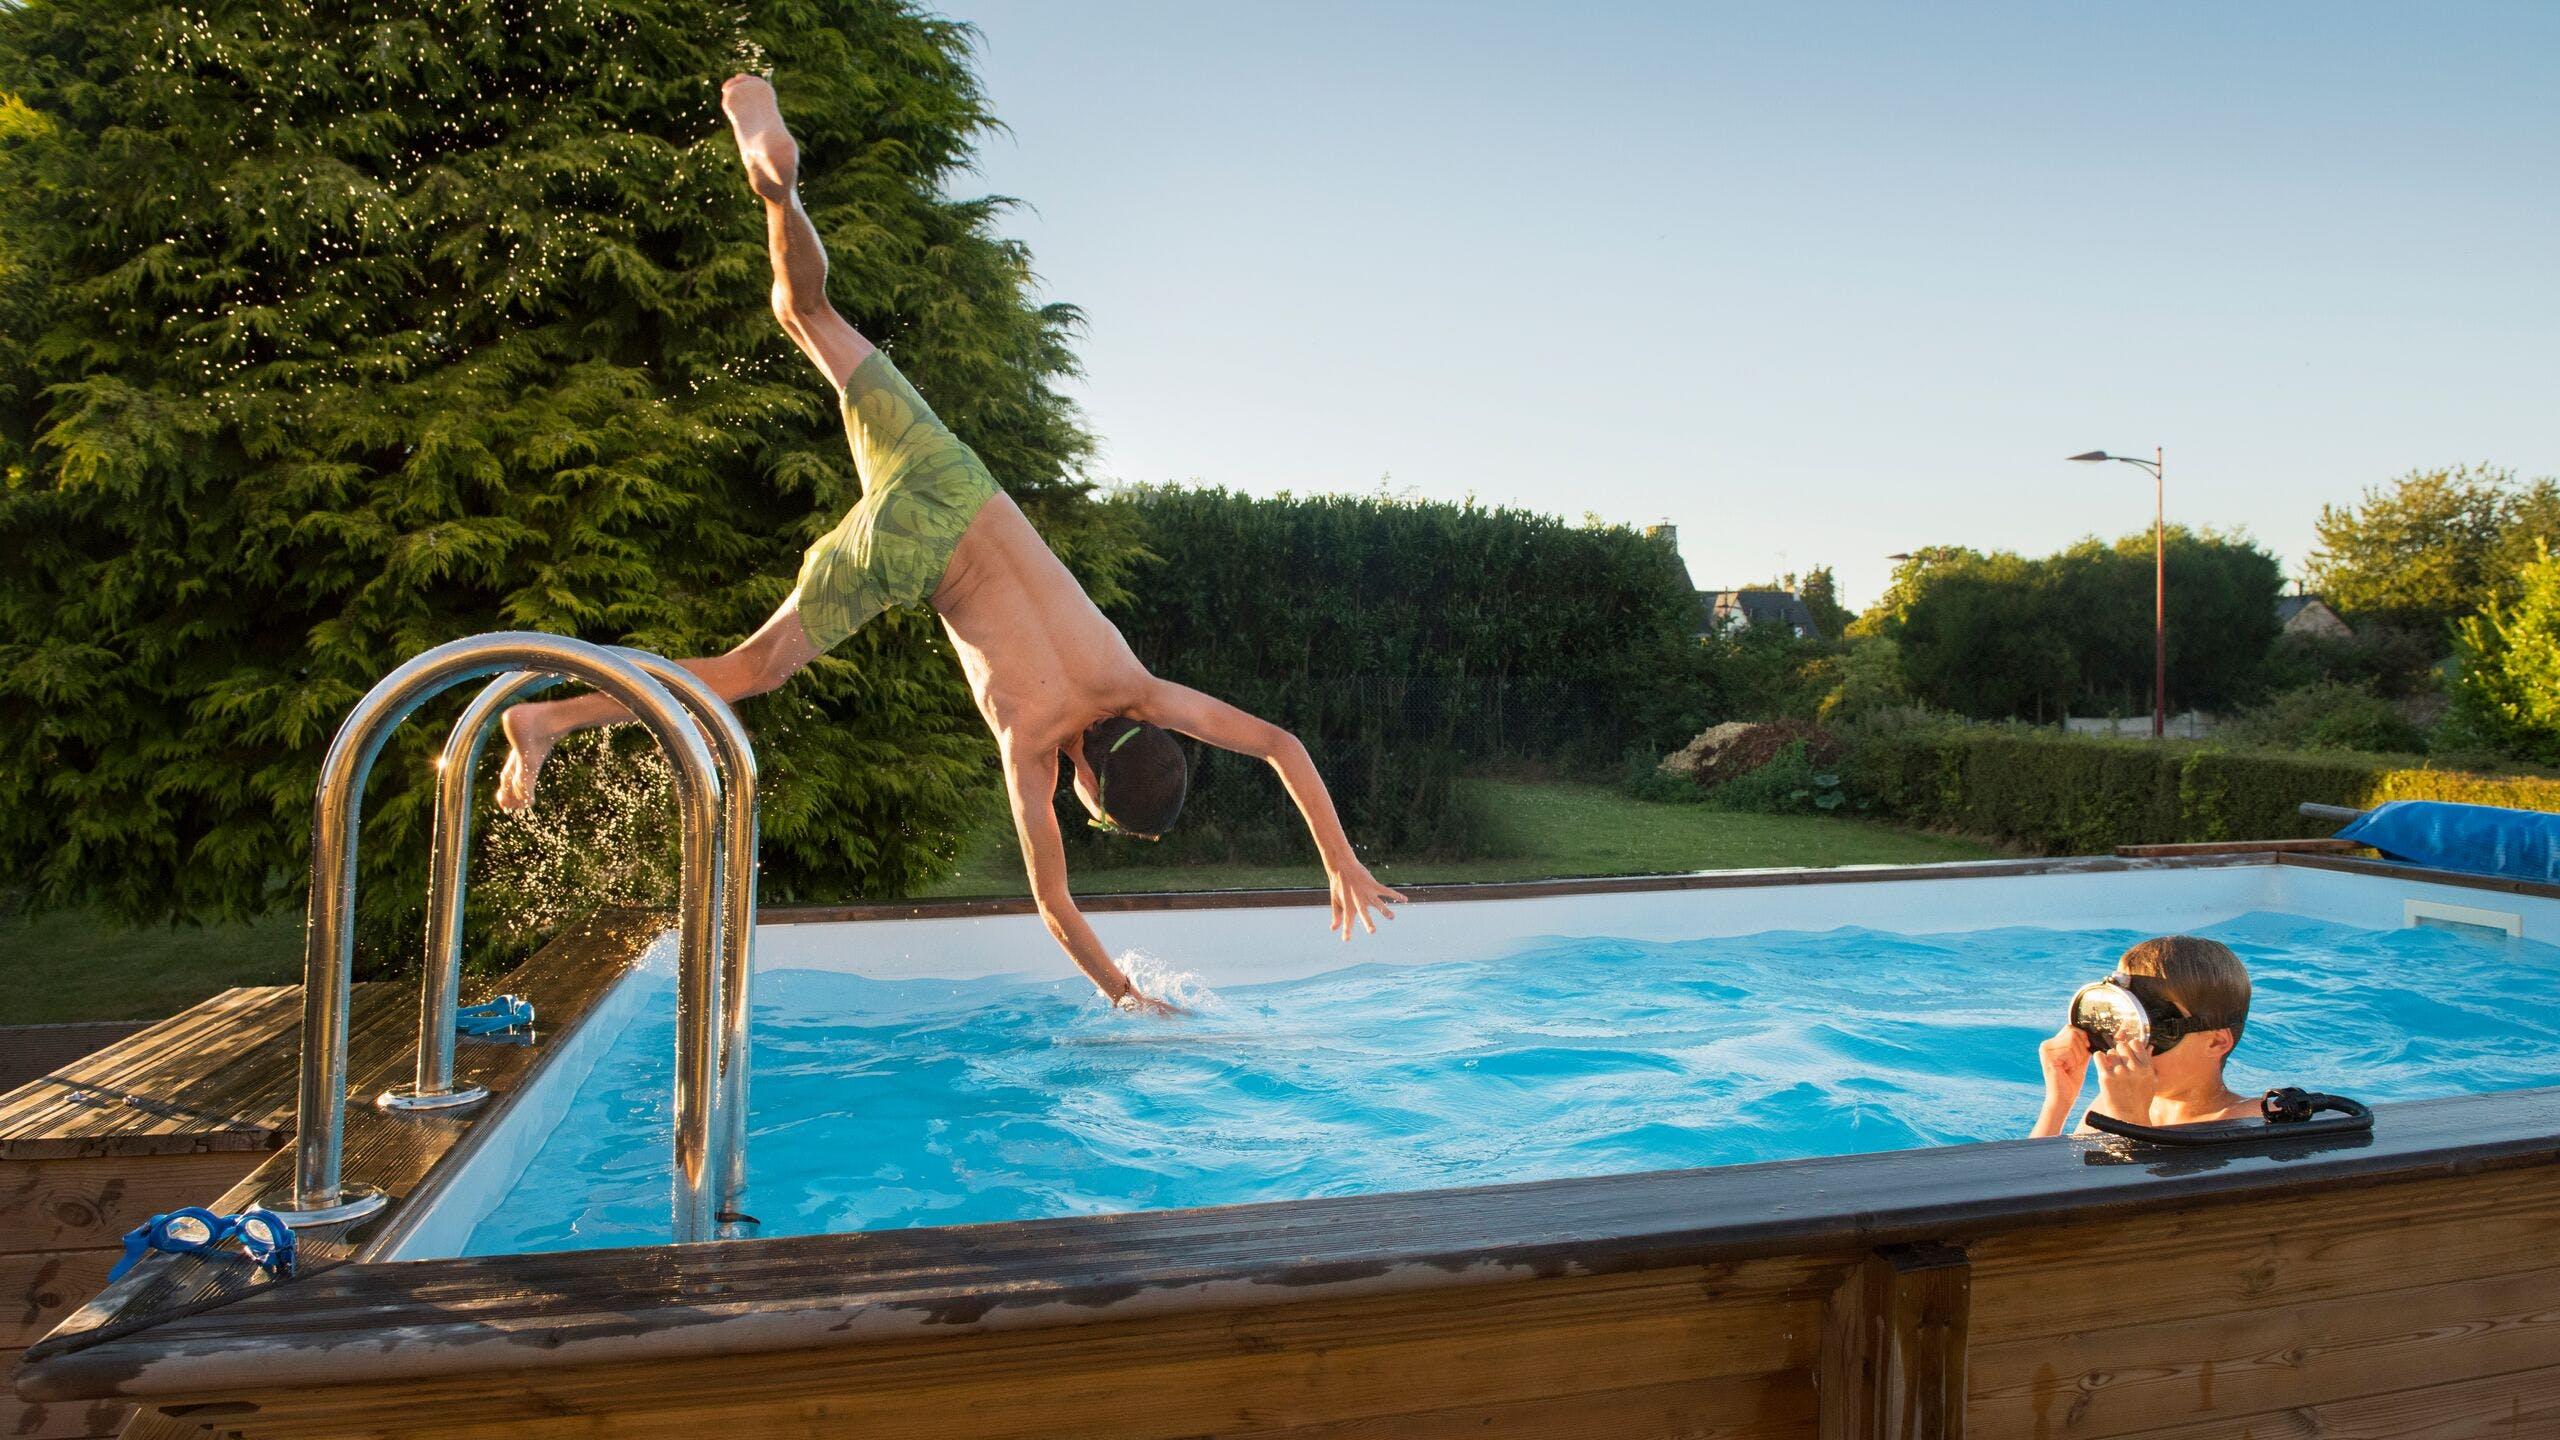 AXA Luxembourg - piscines : ce qui dit la loi